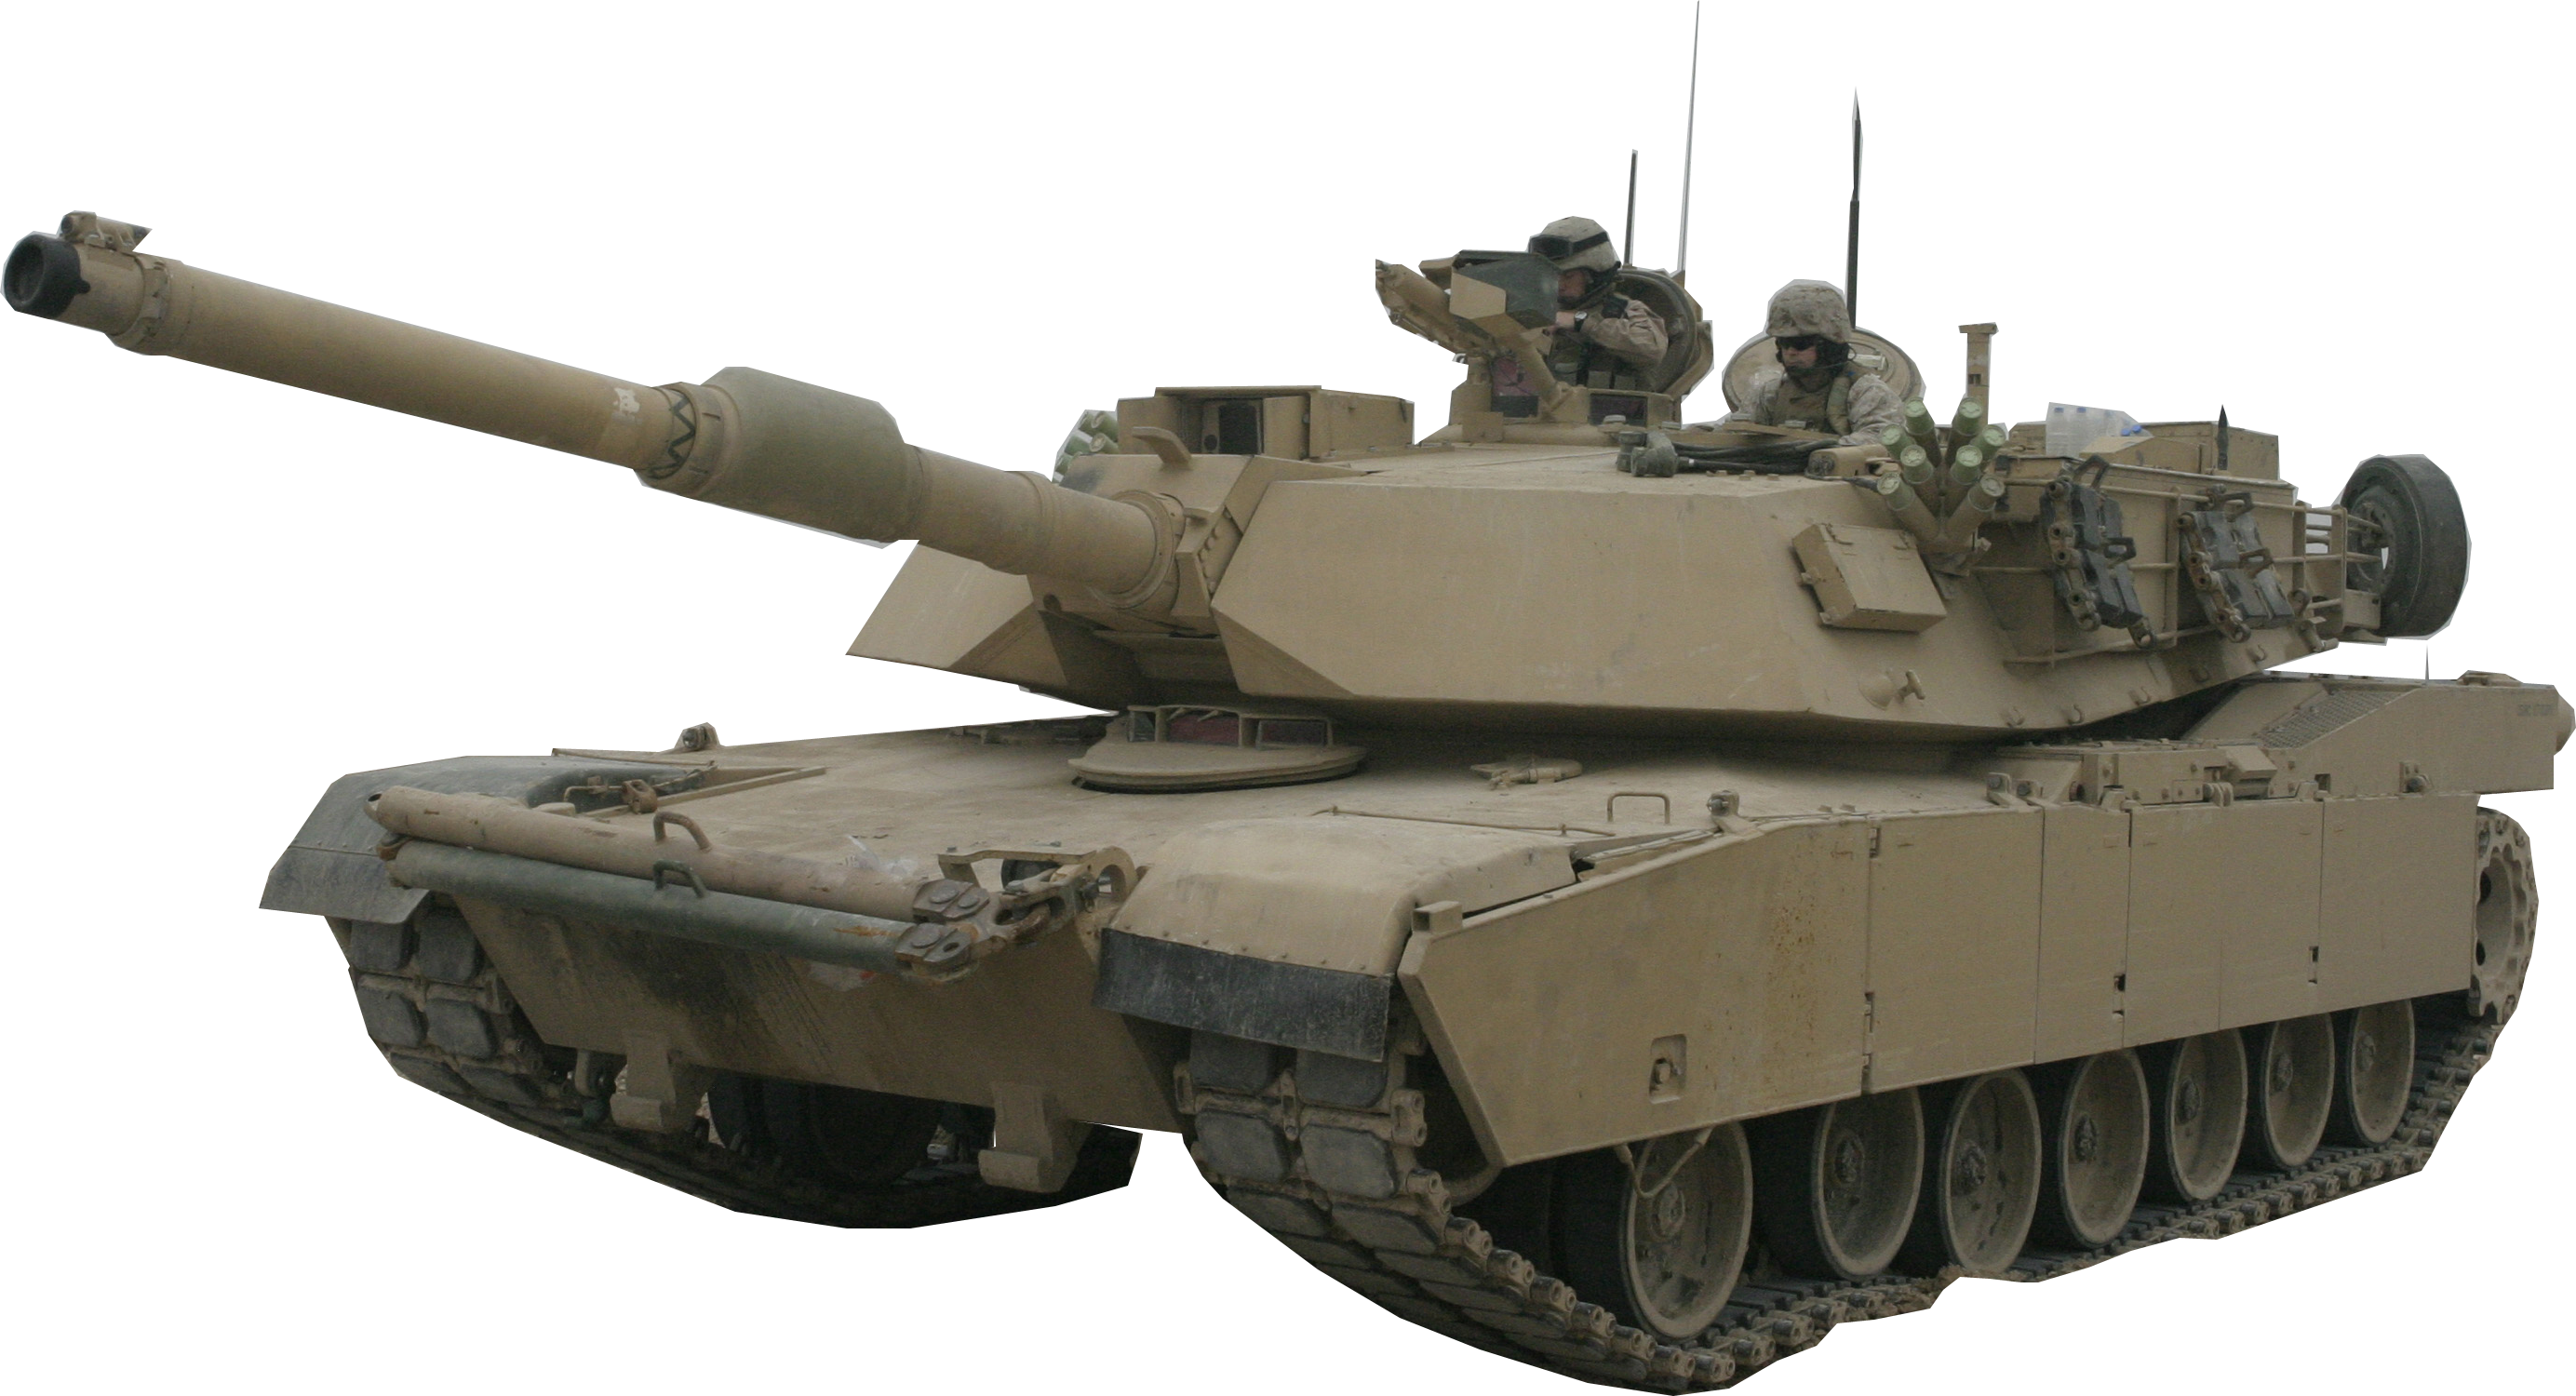 Abrams tank PNG image, armored tank